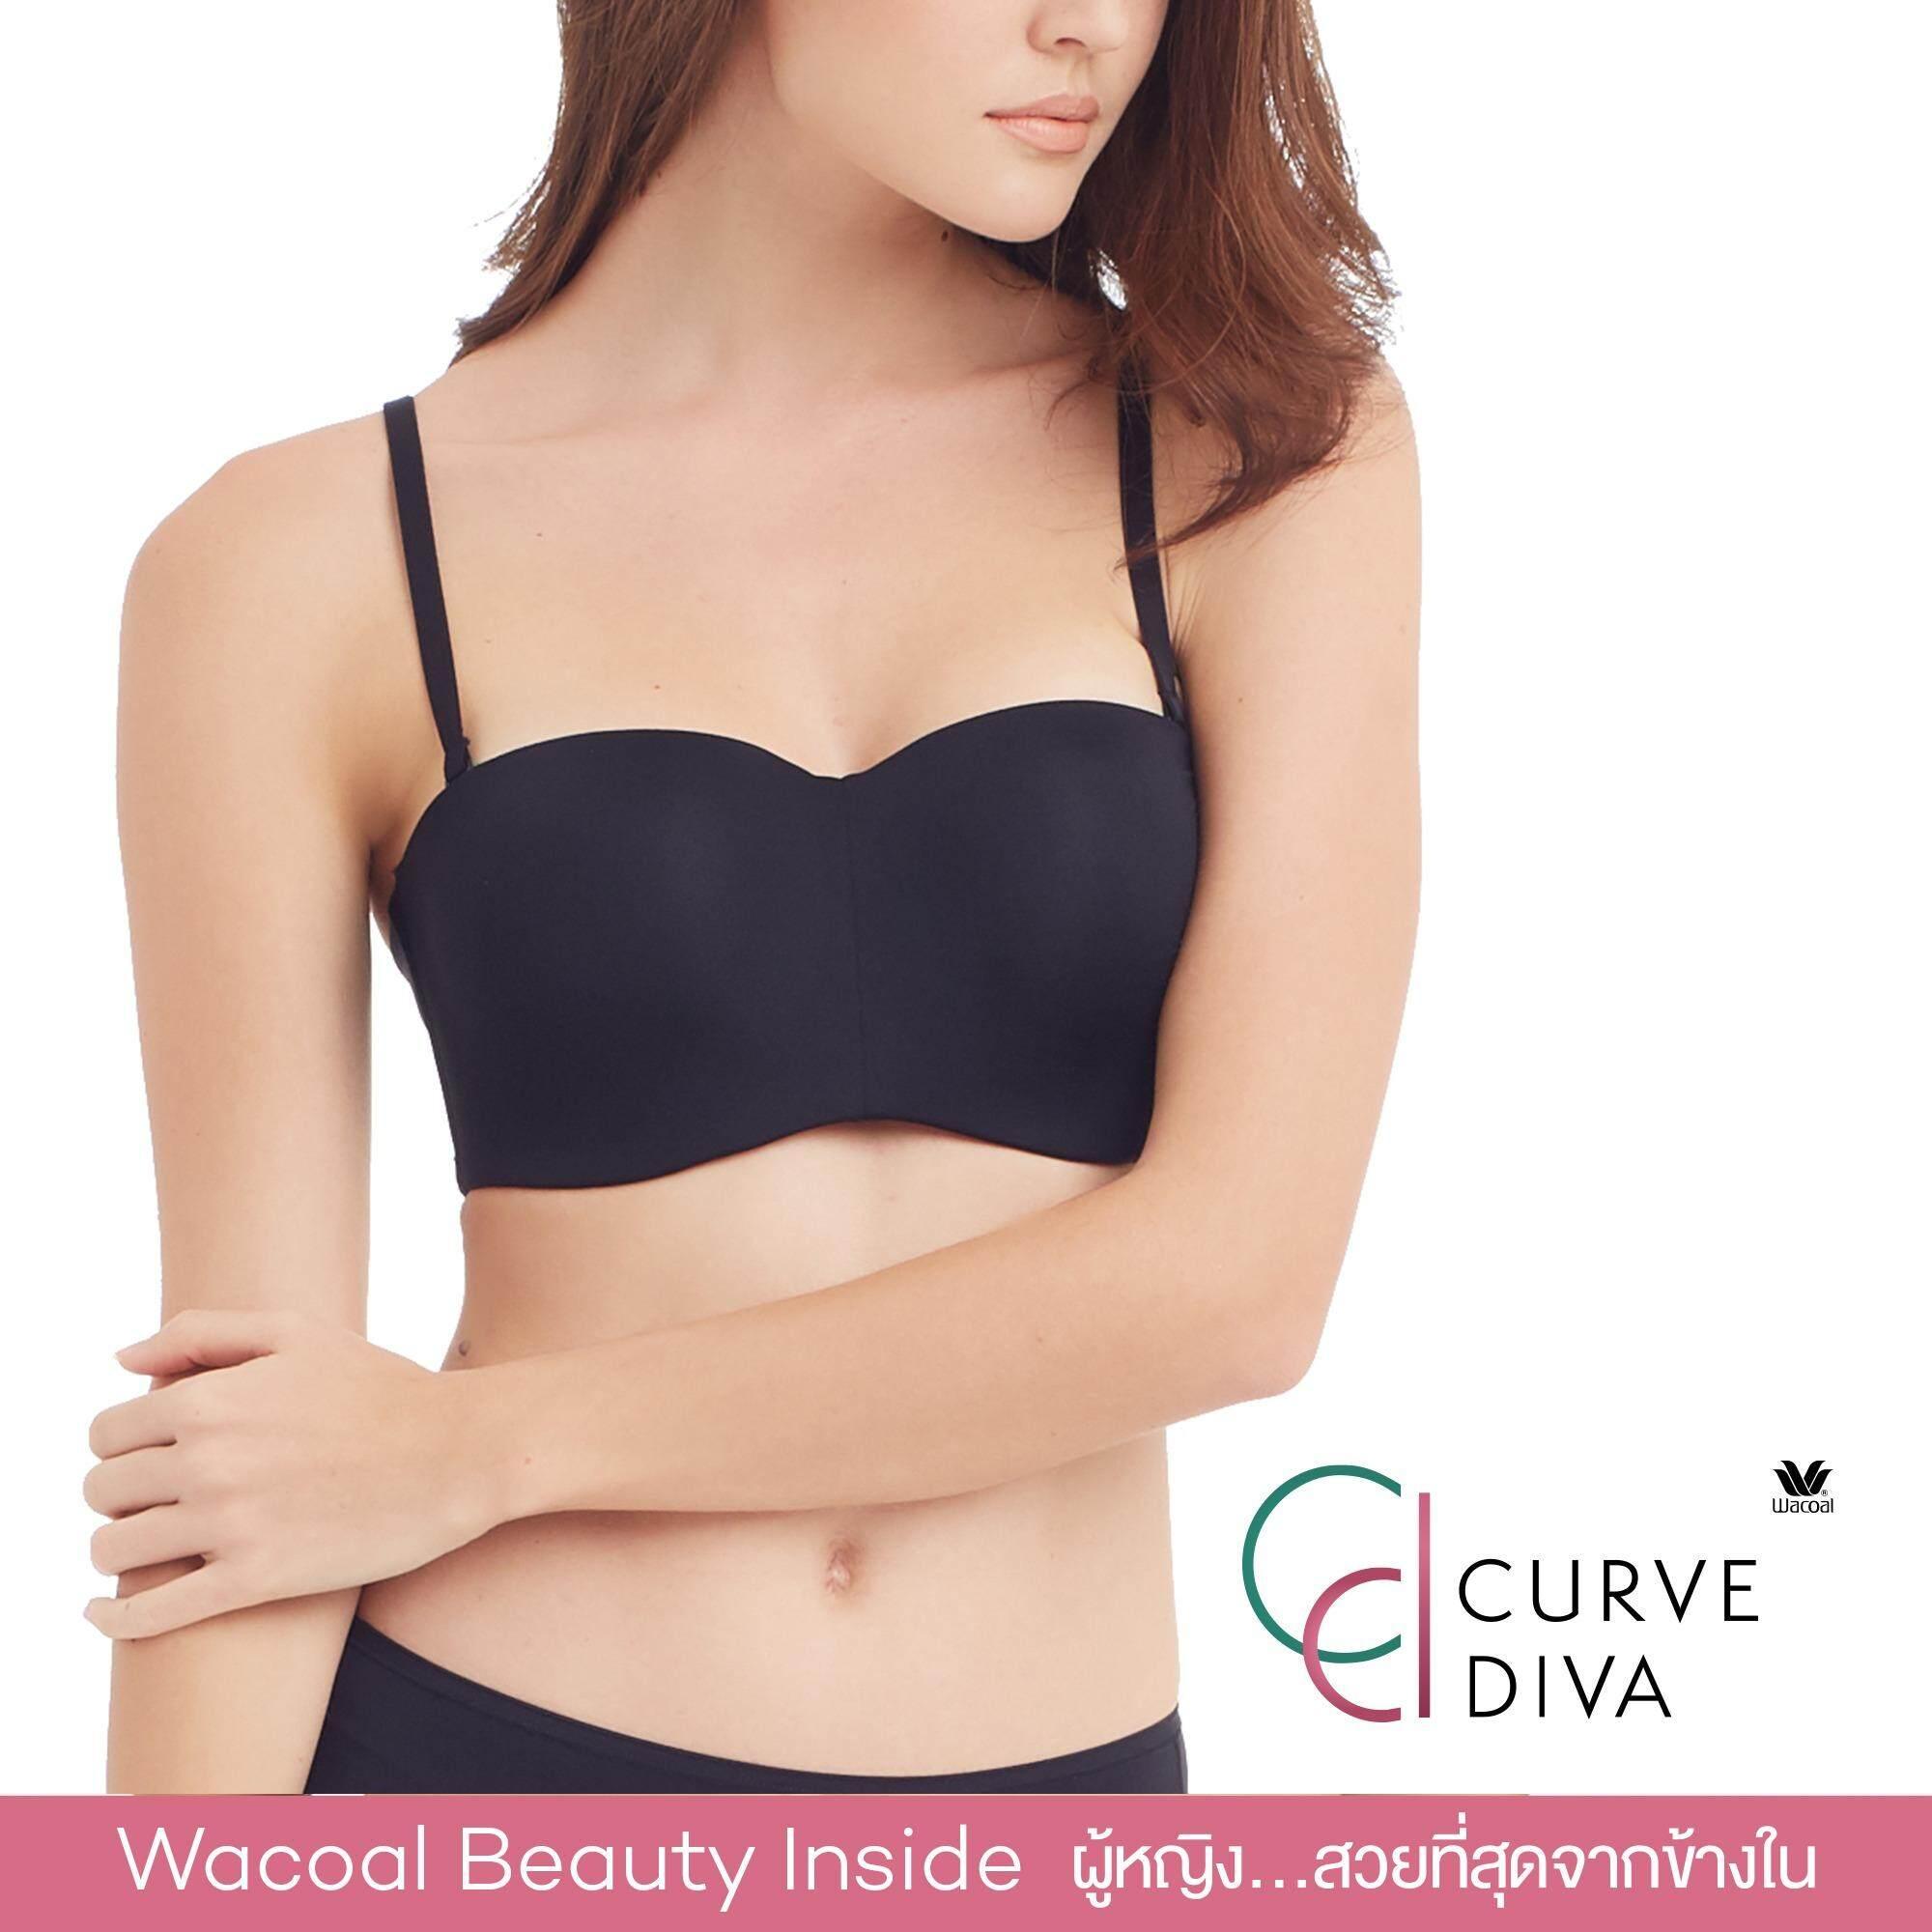 Wacoal Curve Diva Switching bra บราสลับสายบ่า 1/2 Cup (สีดำ/BLACK) - WB7939BL